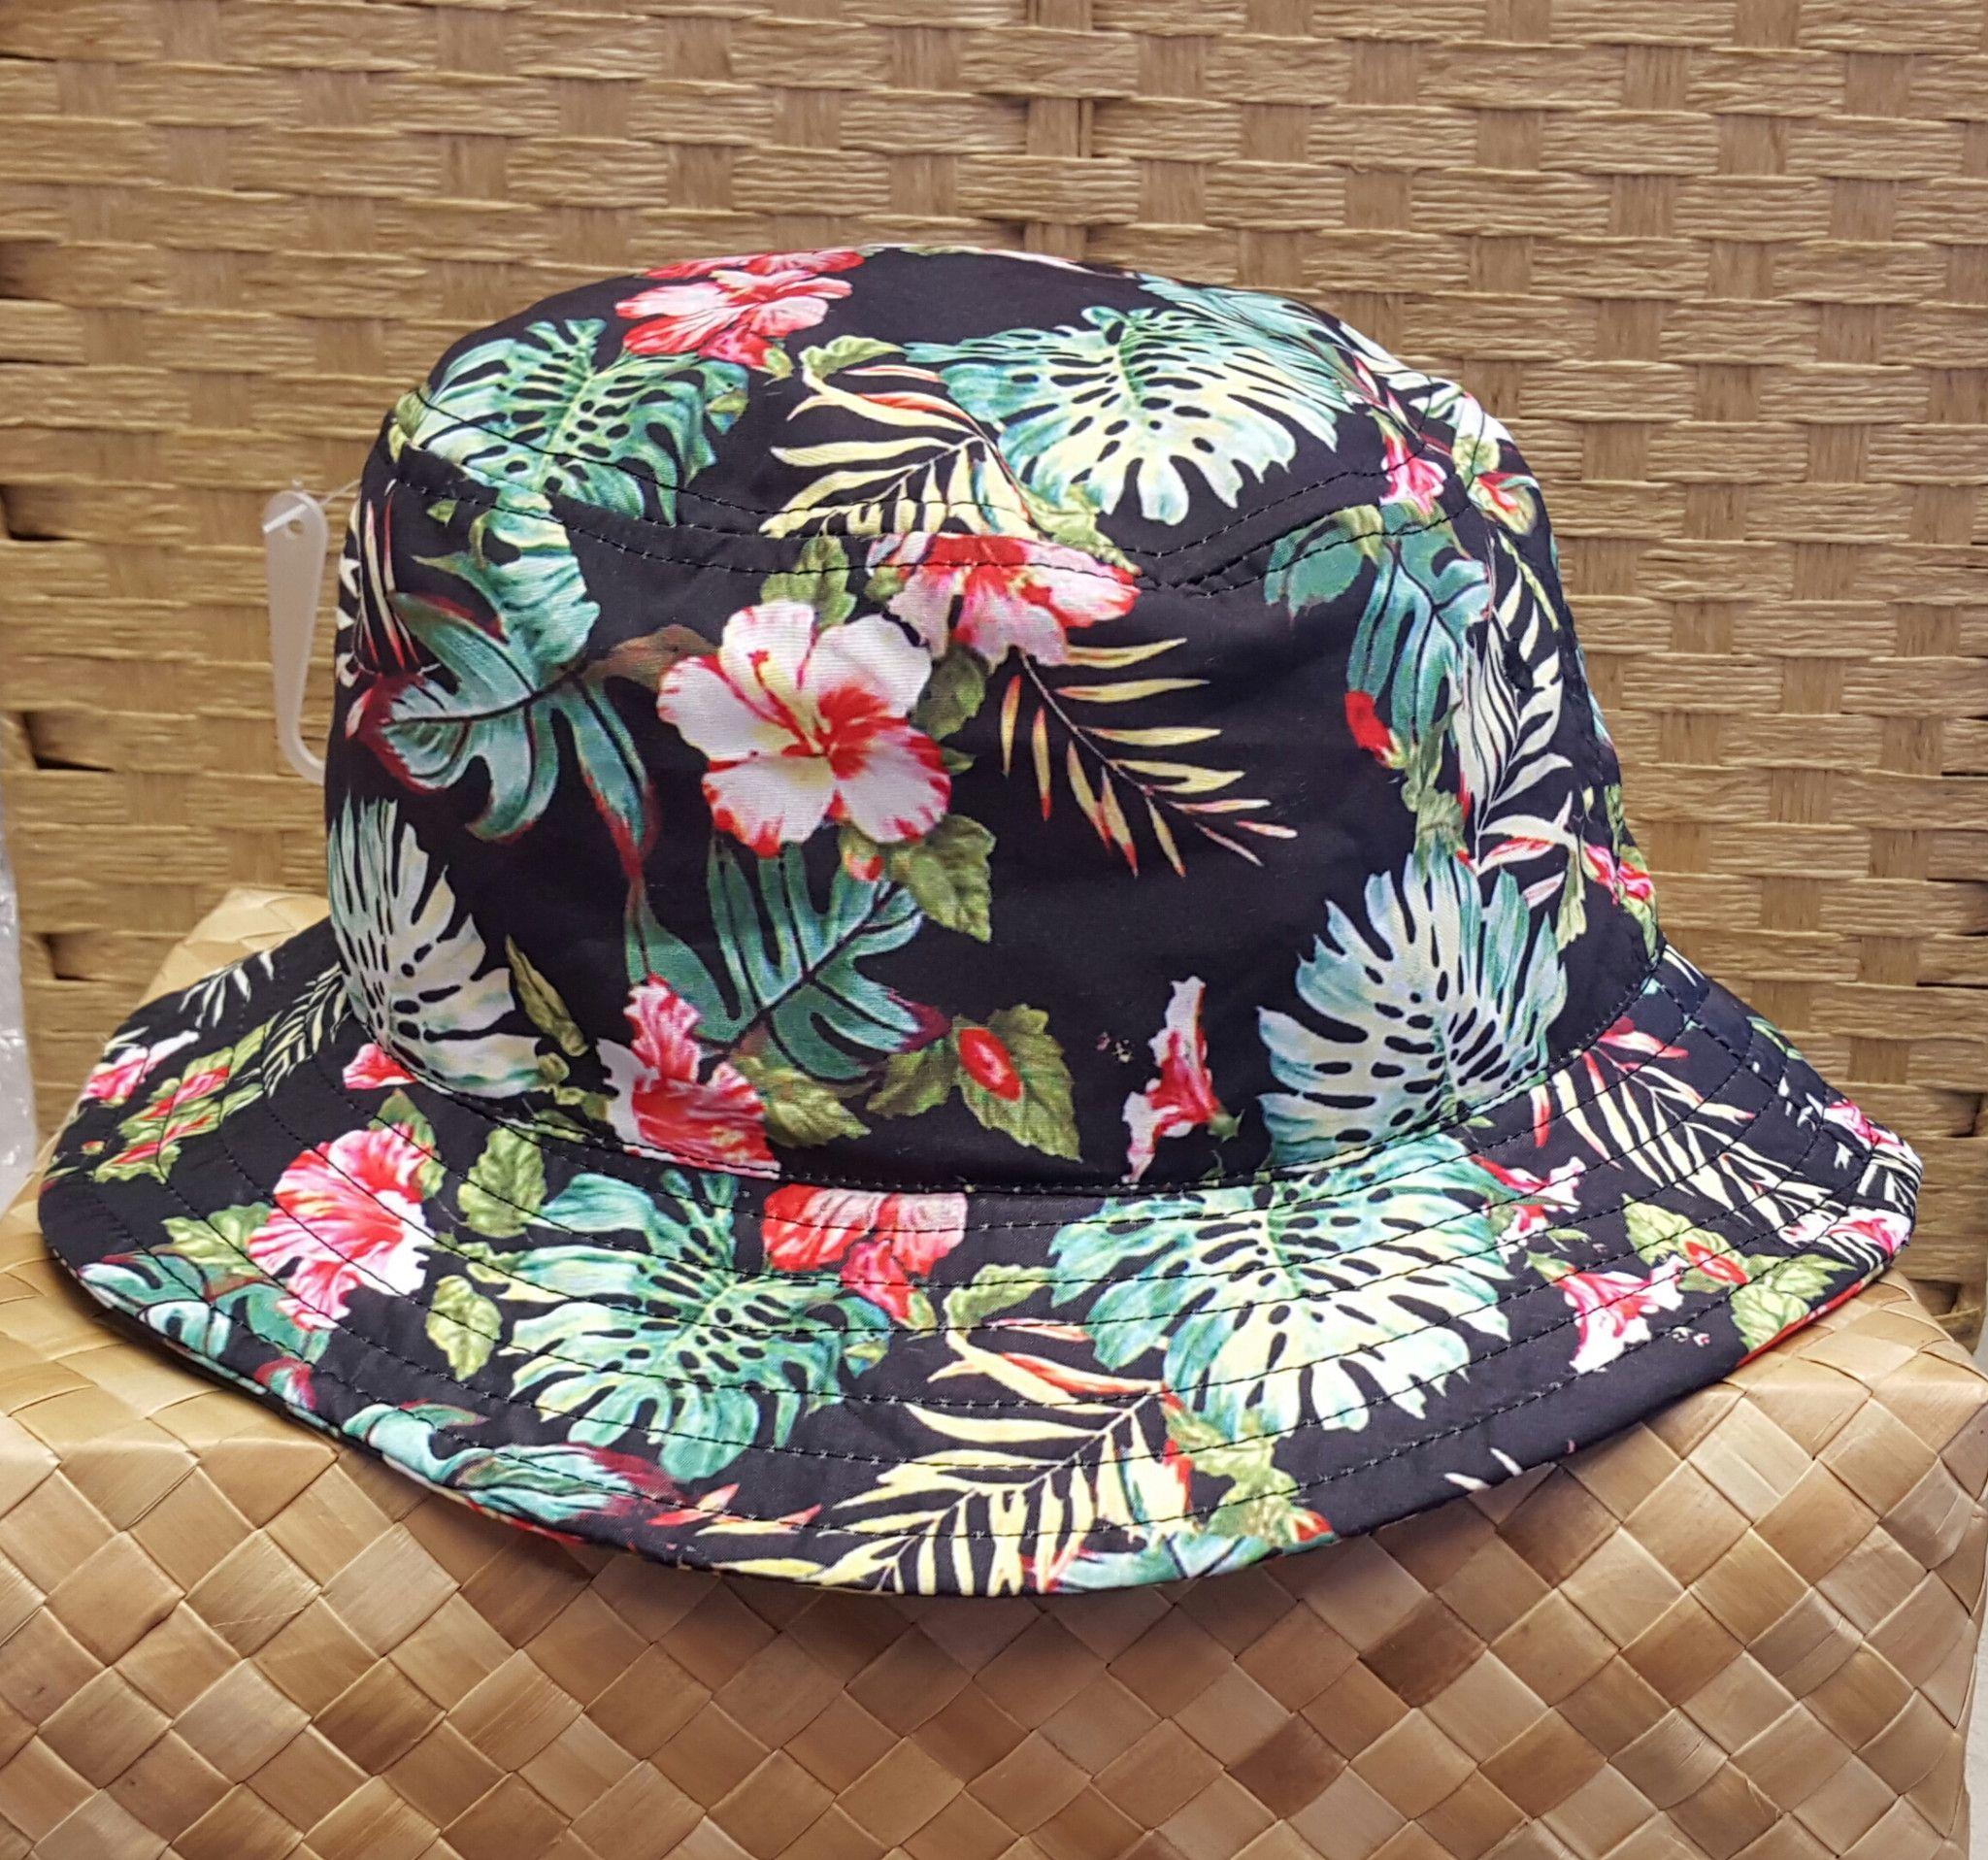 Lids Floral Bucket Hat Floral Bucket Hat Hats Bucket Hat Outfit